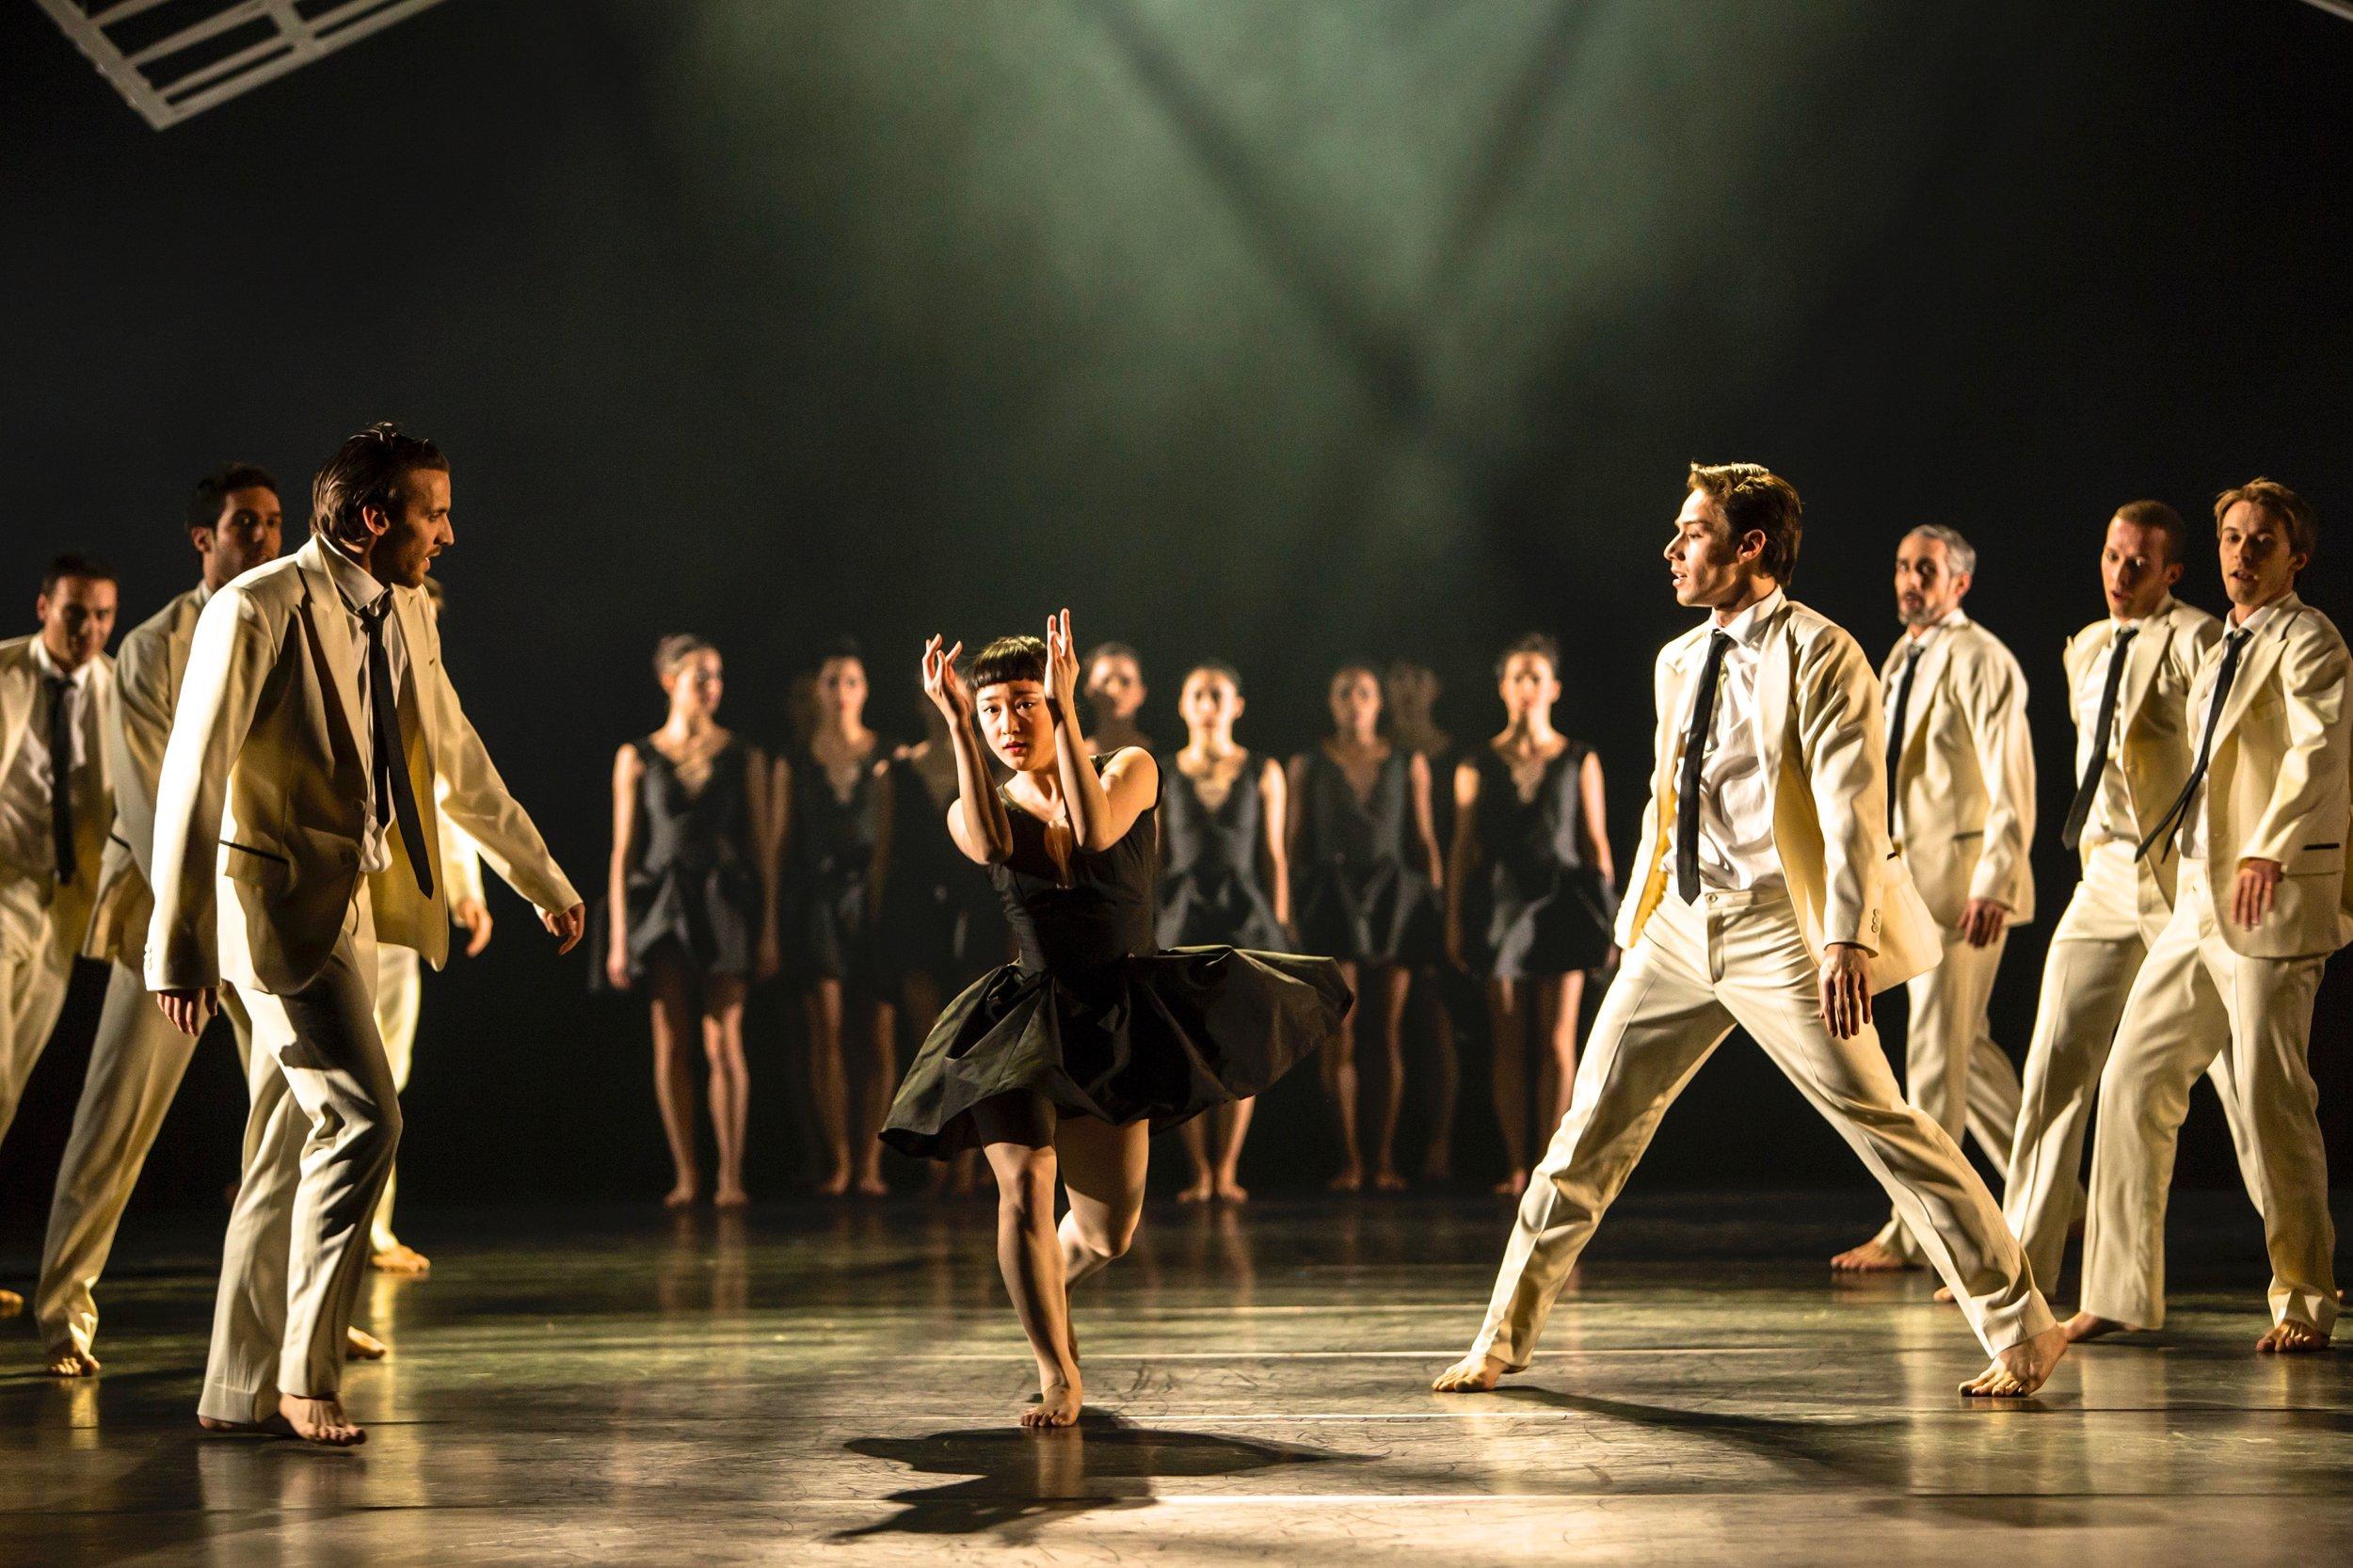 Les Noces • Geneva Ballet • Choreographer Didy Veldman • Designer Miriam Buether